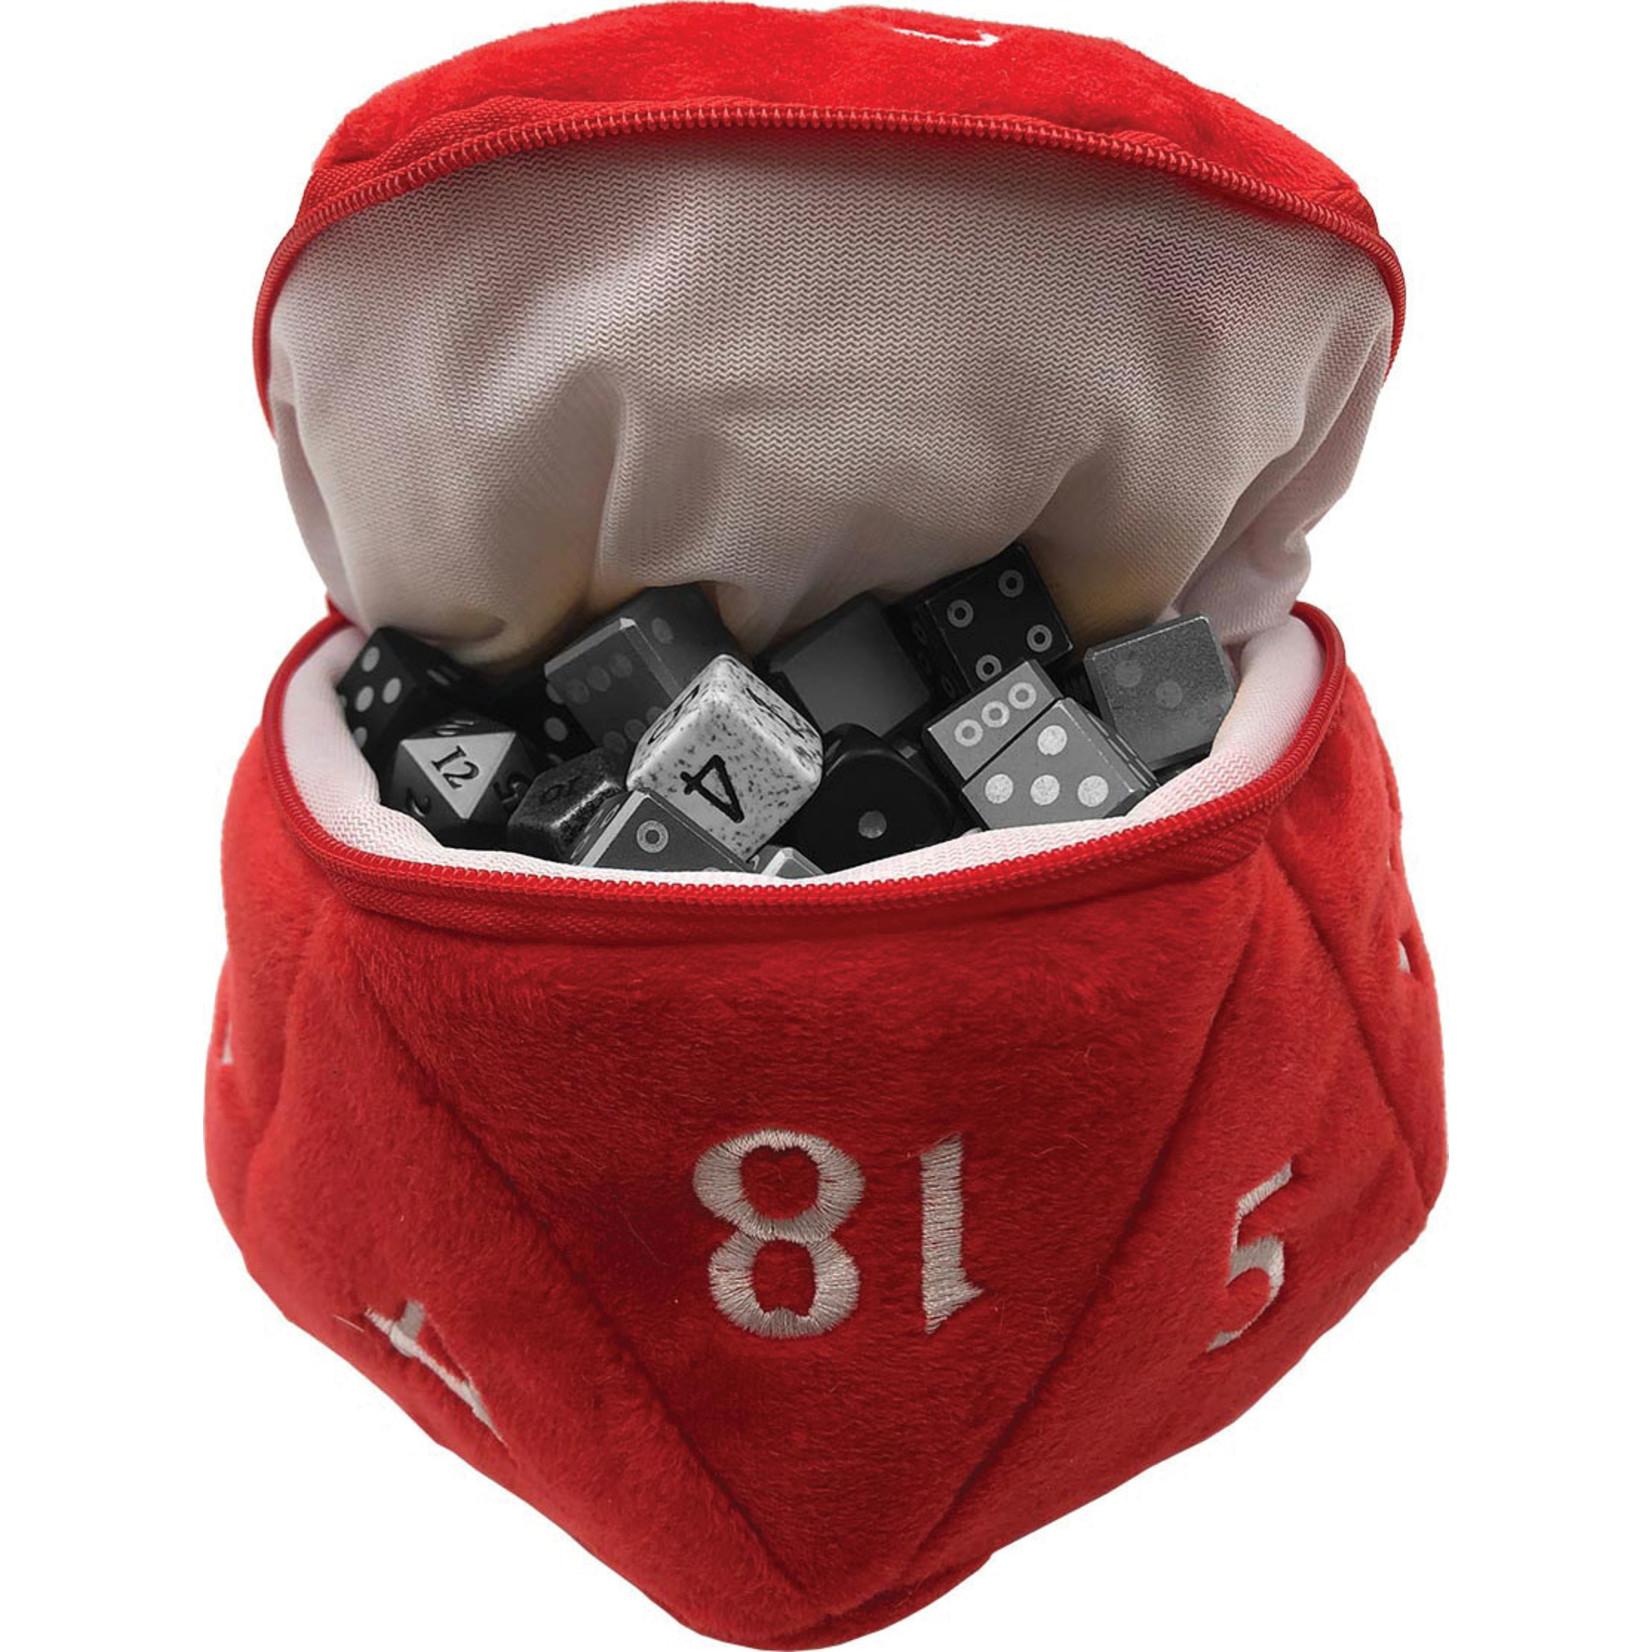 D20 Plush Dice Bag - Red